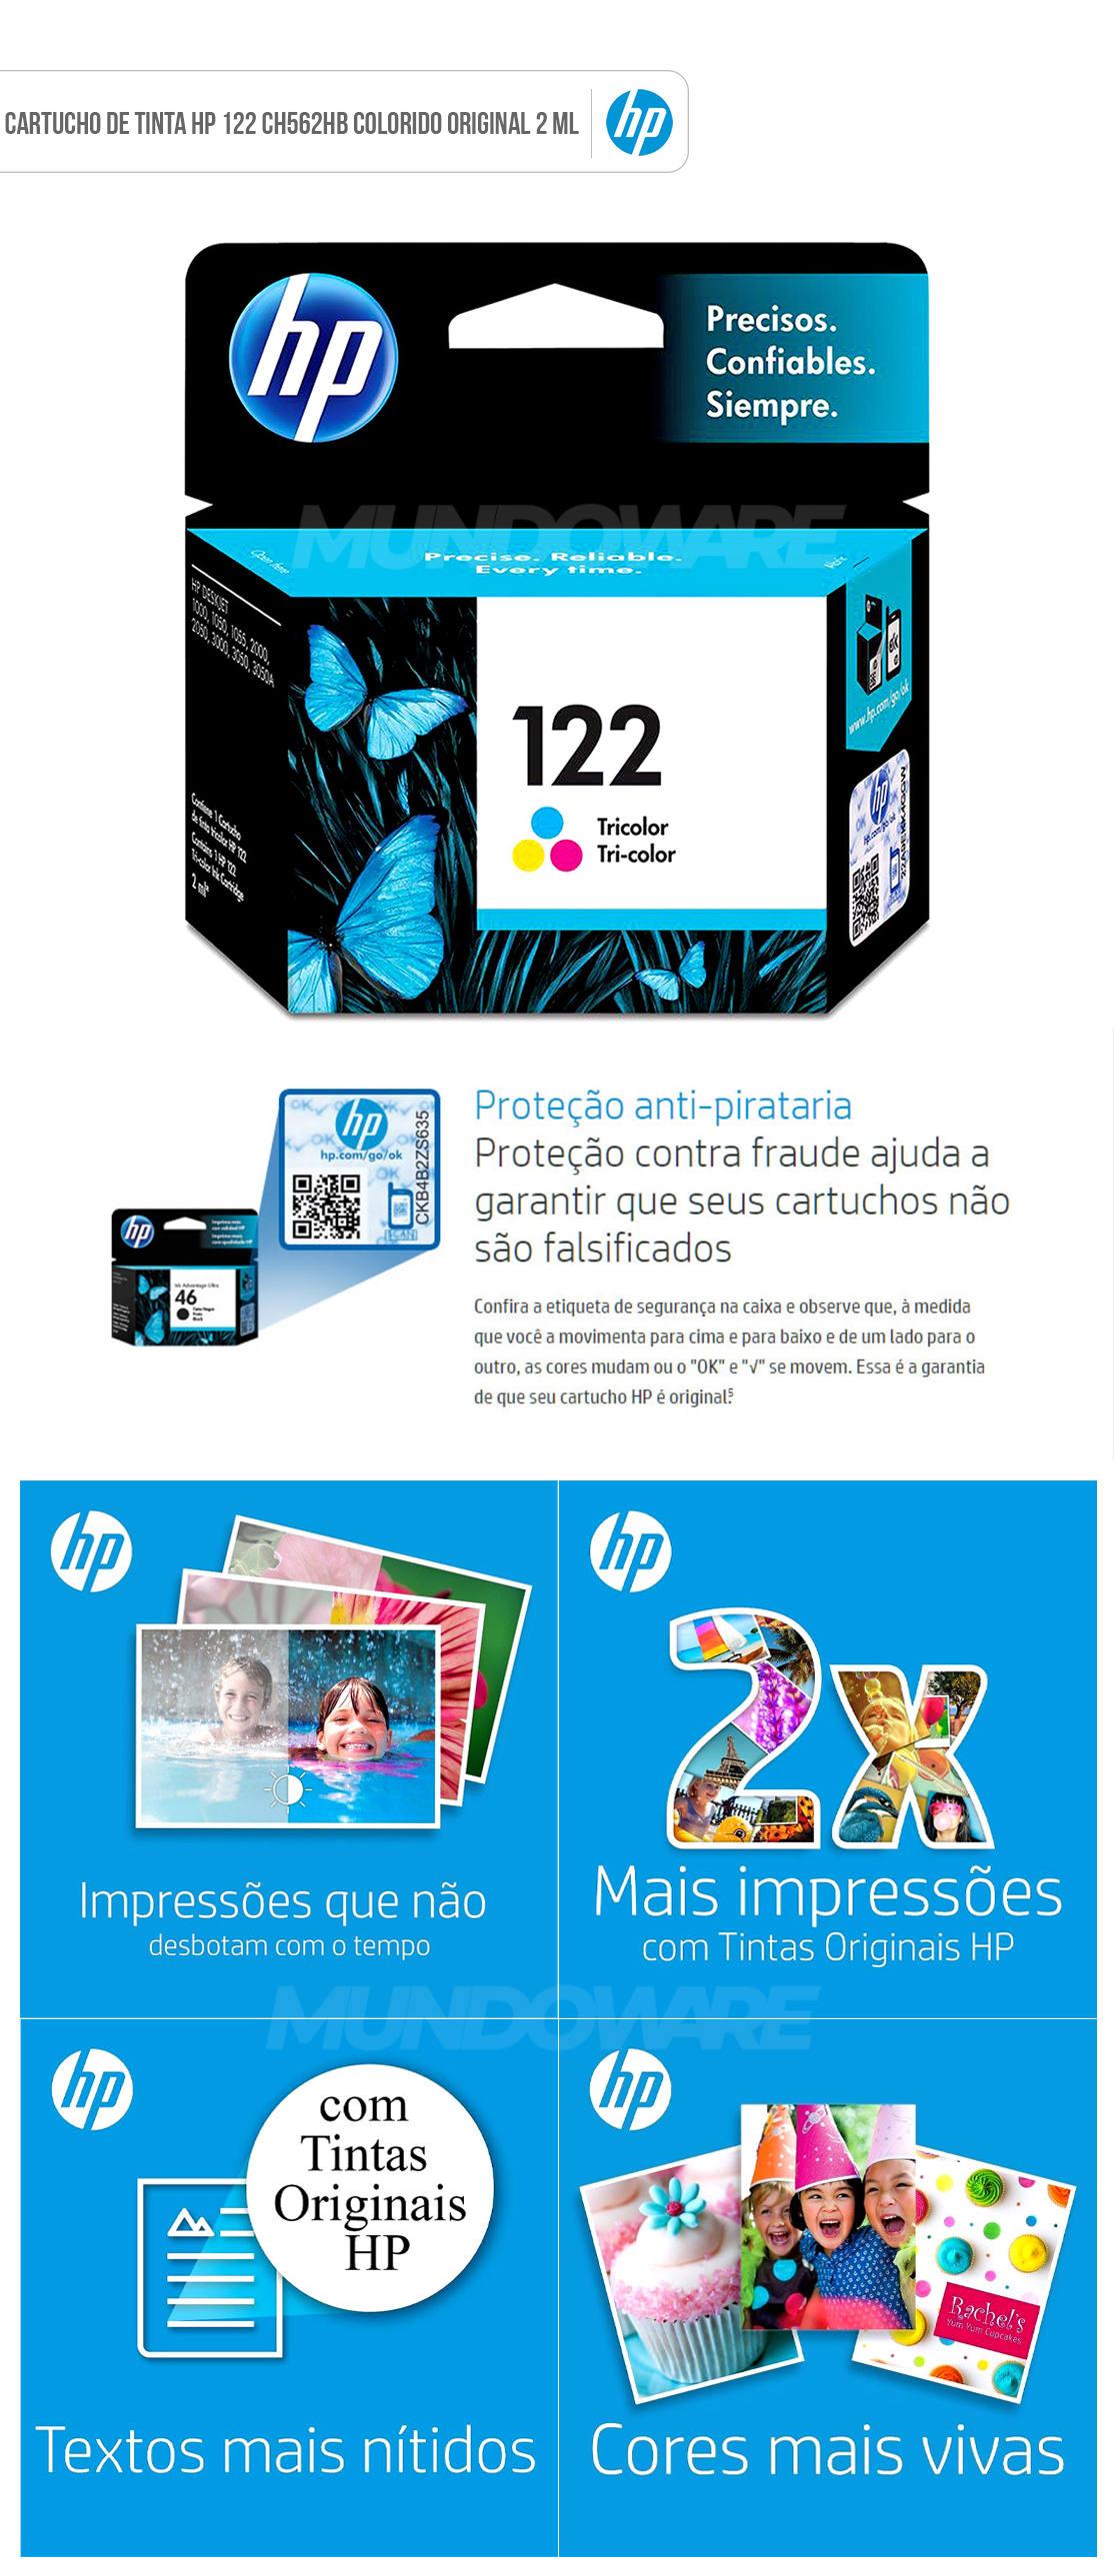 Cartucho de Tinta HP 122 Colorido CH562HB para HP Deskjet 1000 J110a 2000 J210a 2050 J510a 3050 J610a Original 2 ML